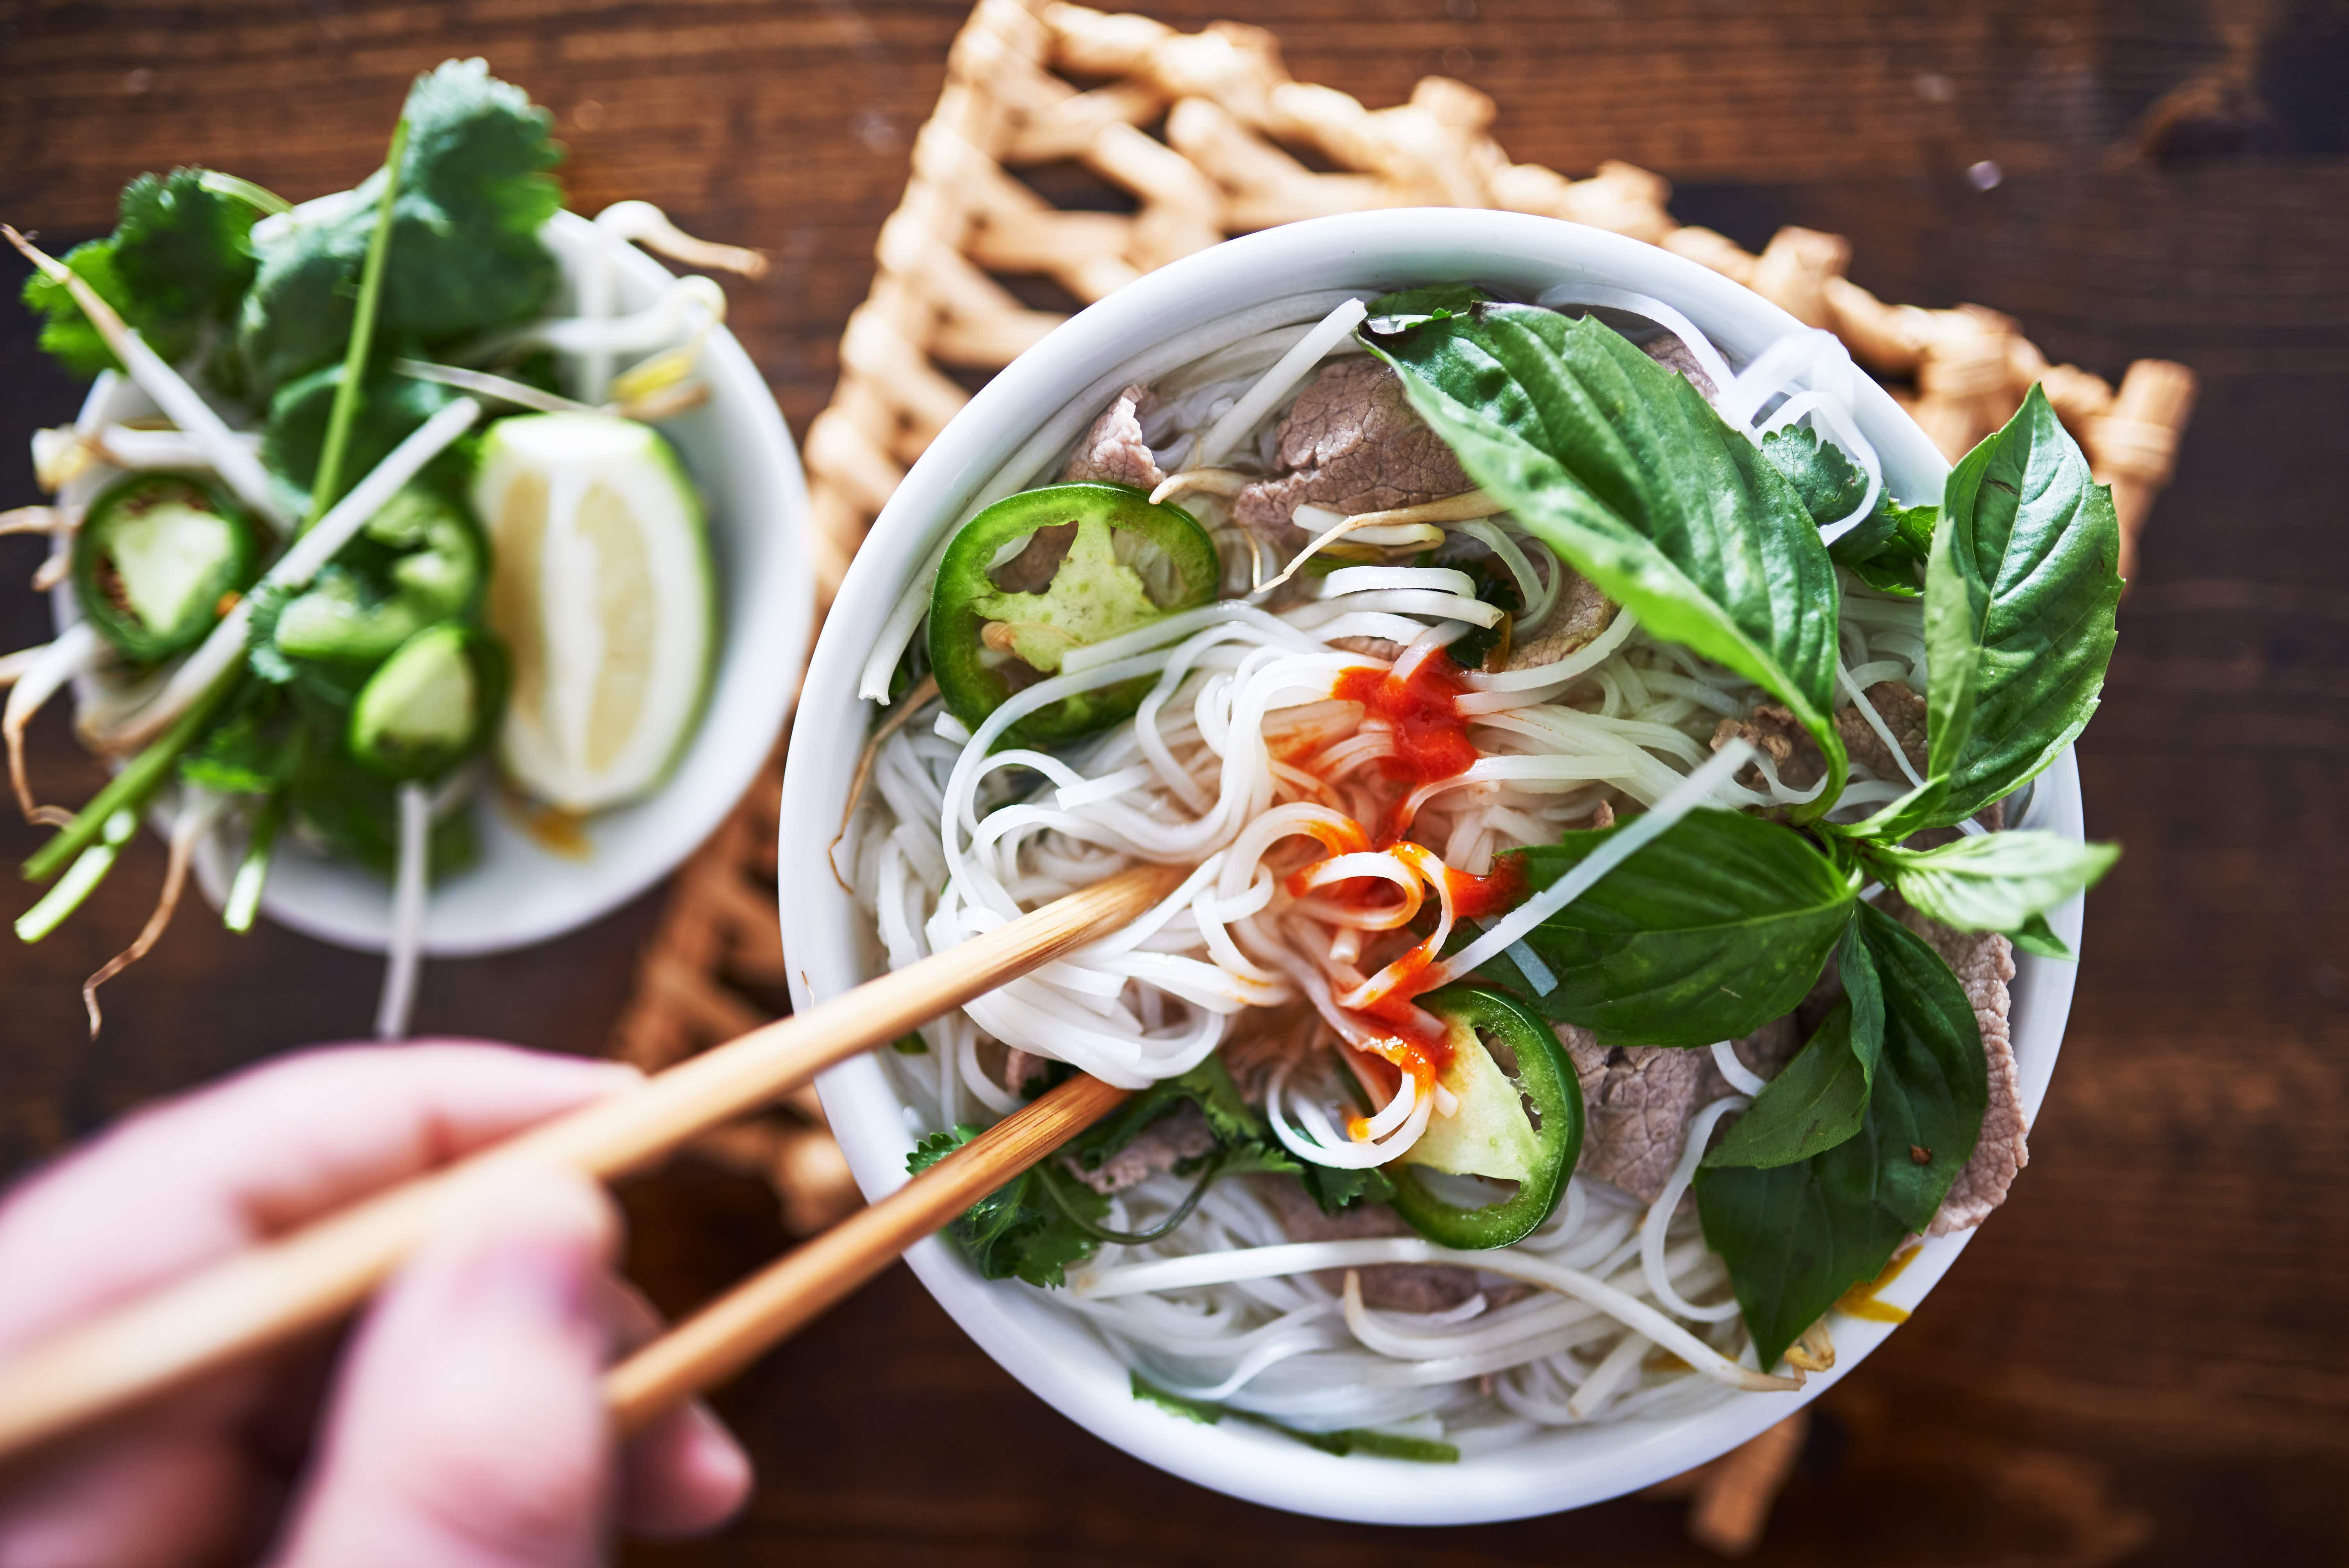 How to make Vietnamese pho